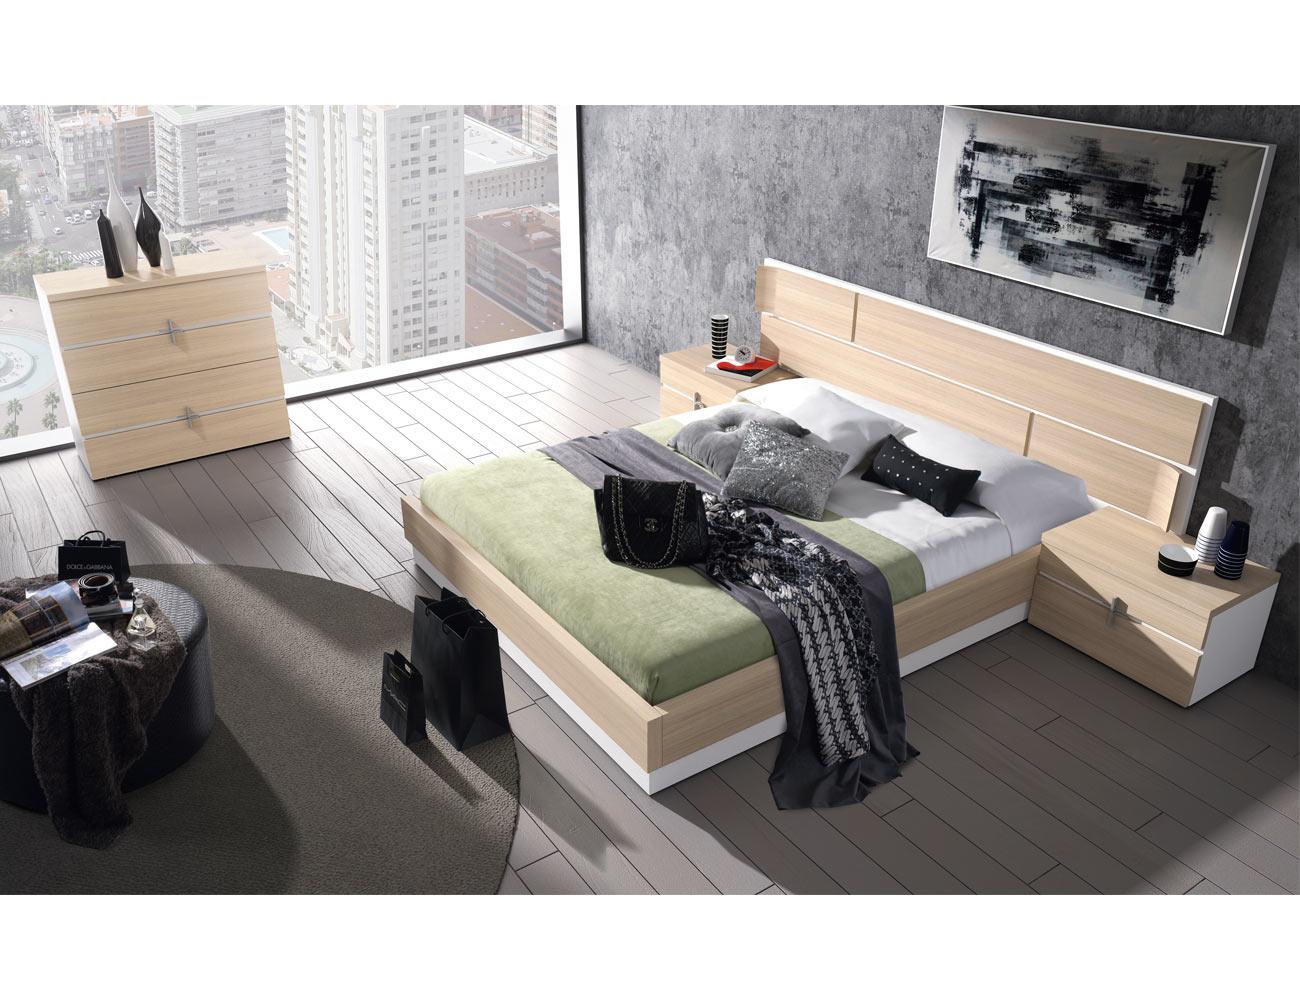 107 dormitorio matrimonio roble nordico blanco comoda bañera